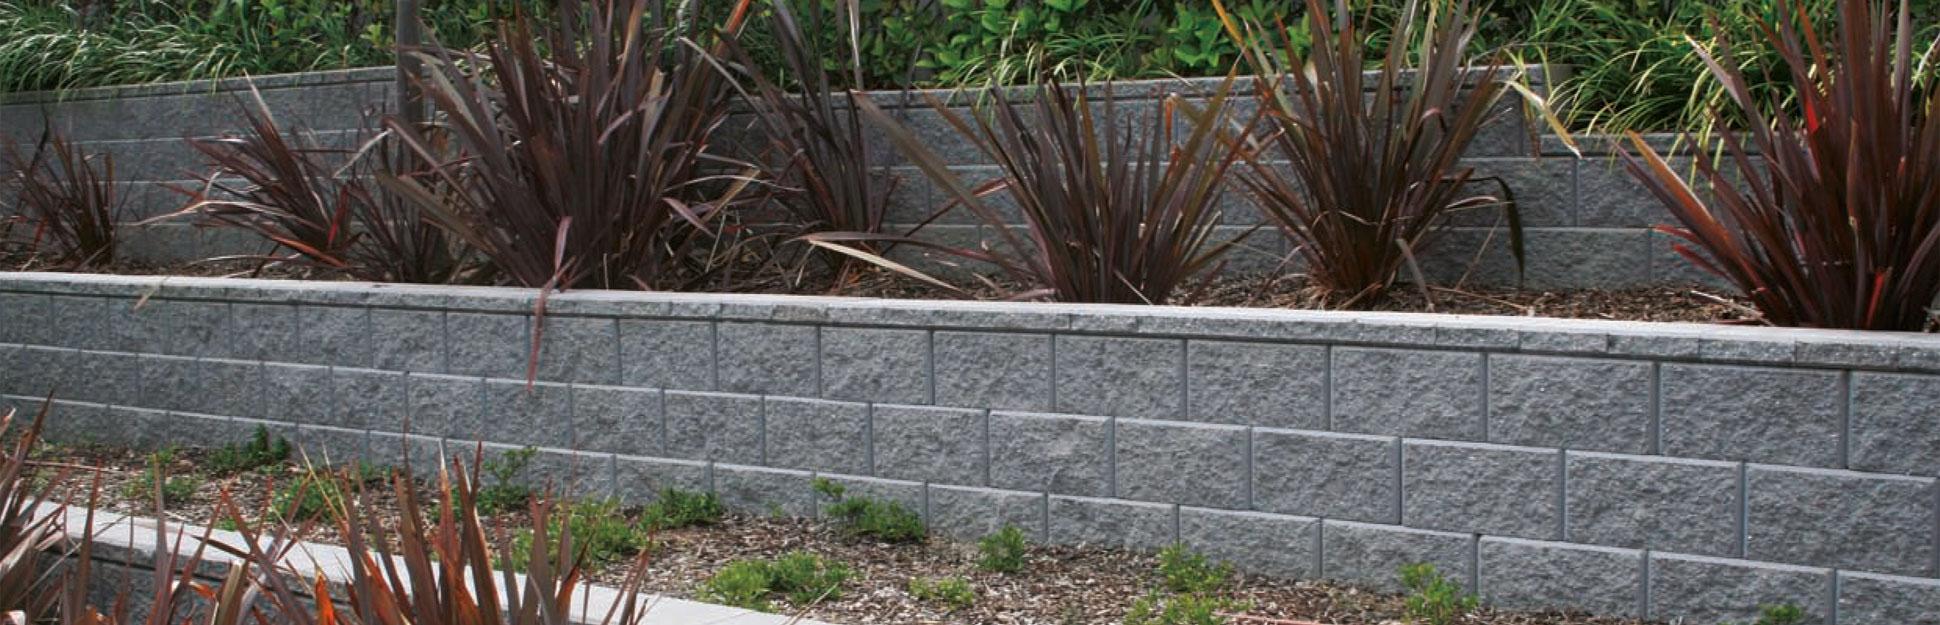 Tasman concrete block retaining wall system